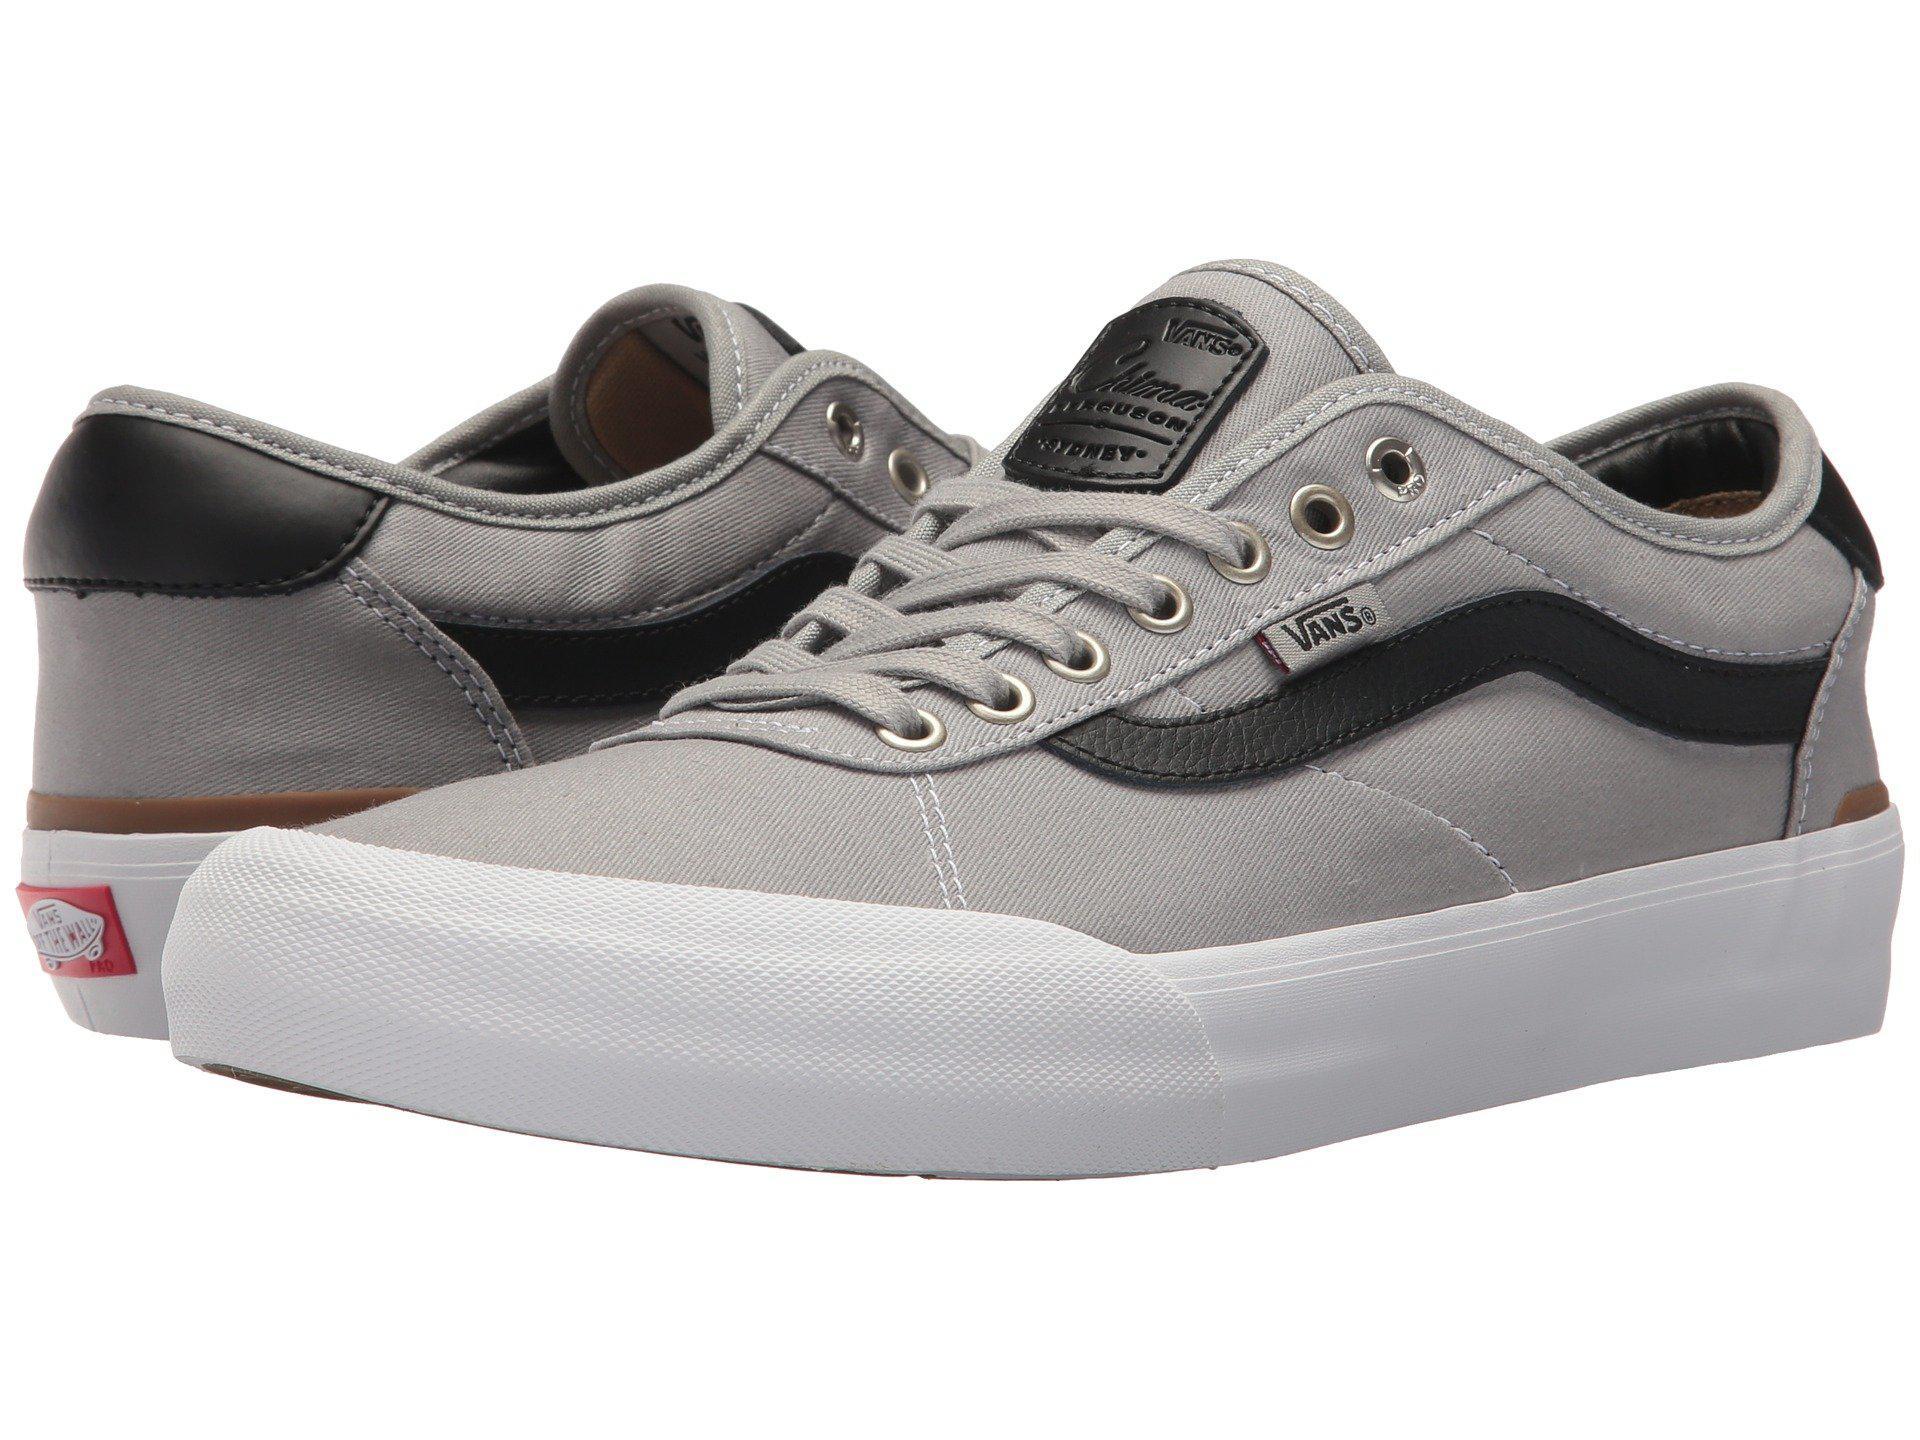 fc963ab1db2 Lyst - Vans Chima Pro 2 (black (canvas) white) Men s Skate Shoes for Men